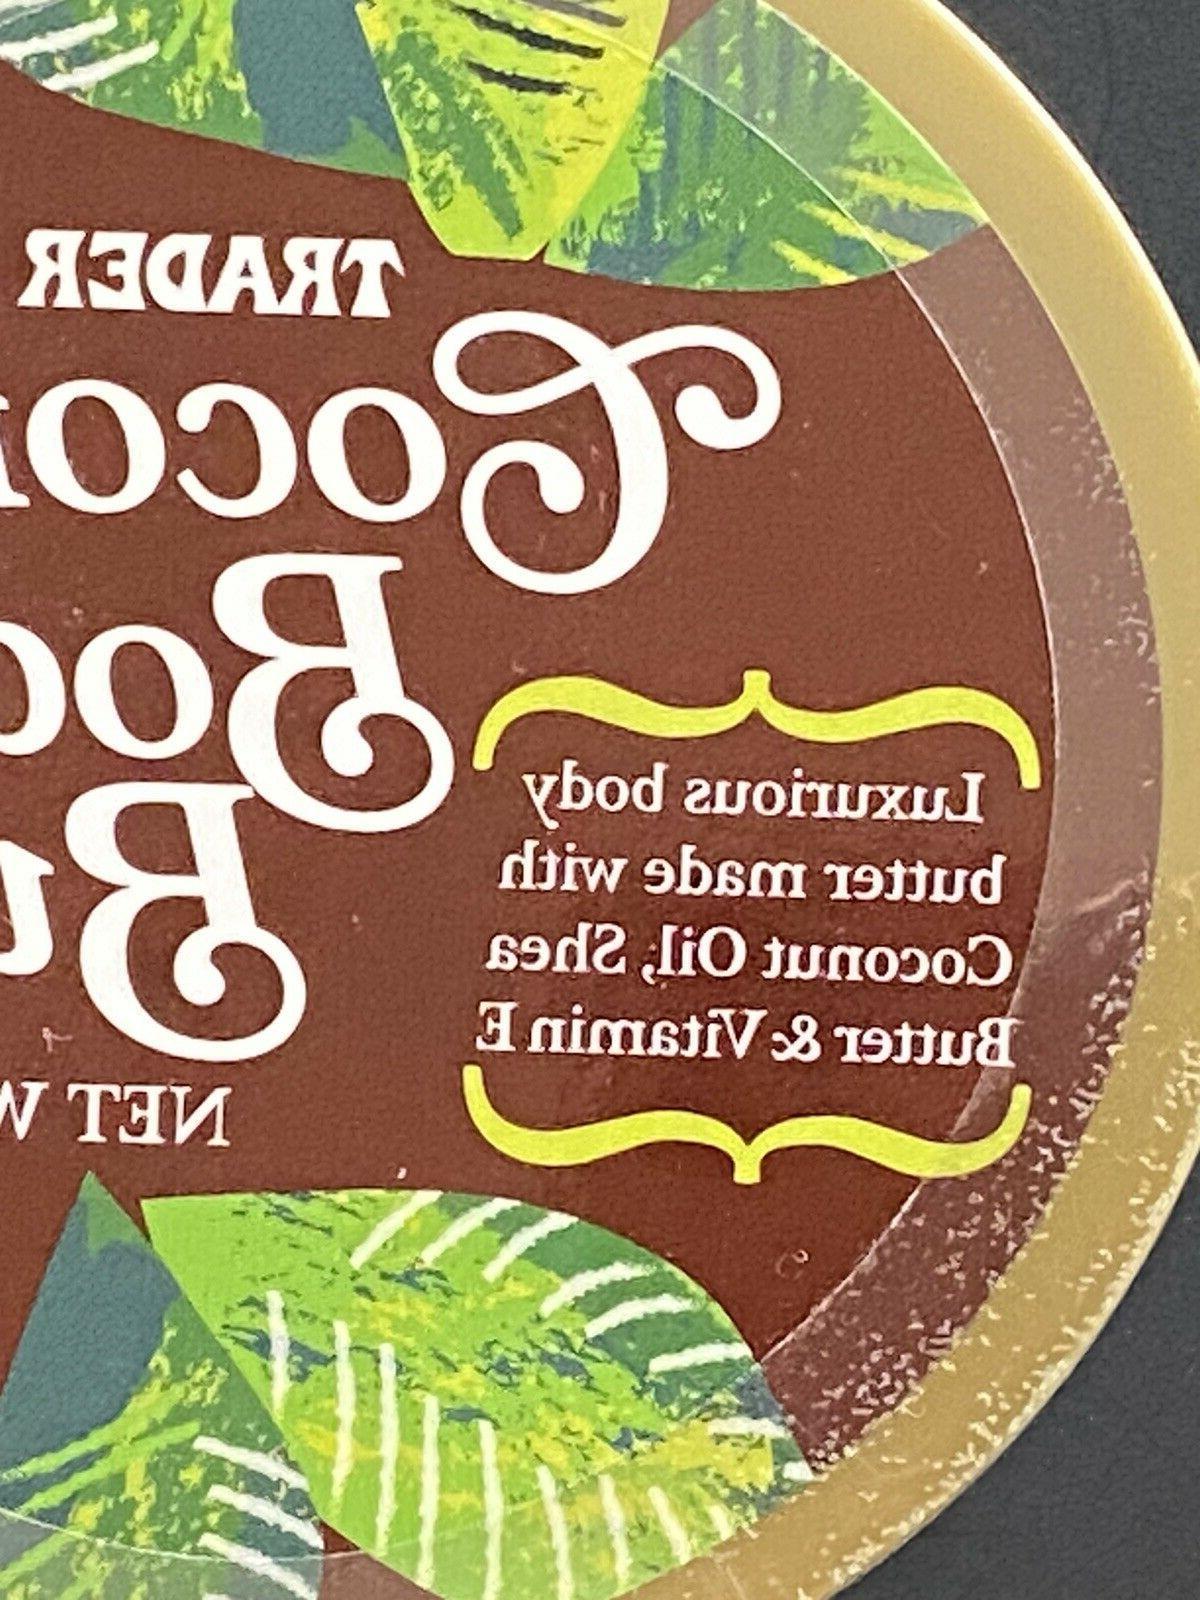 trader body butter Cream made Coconut oil,Shea Butter& E